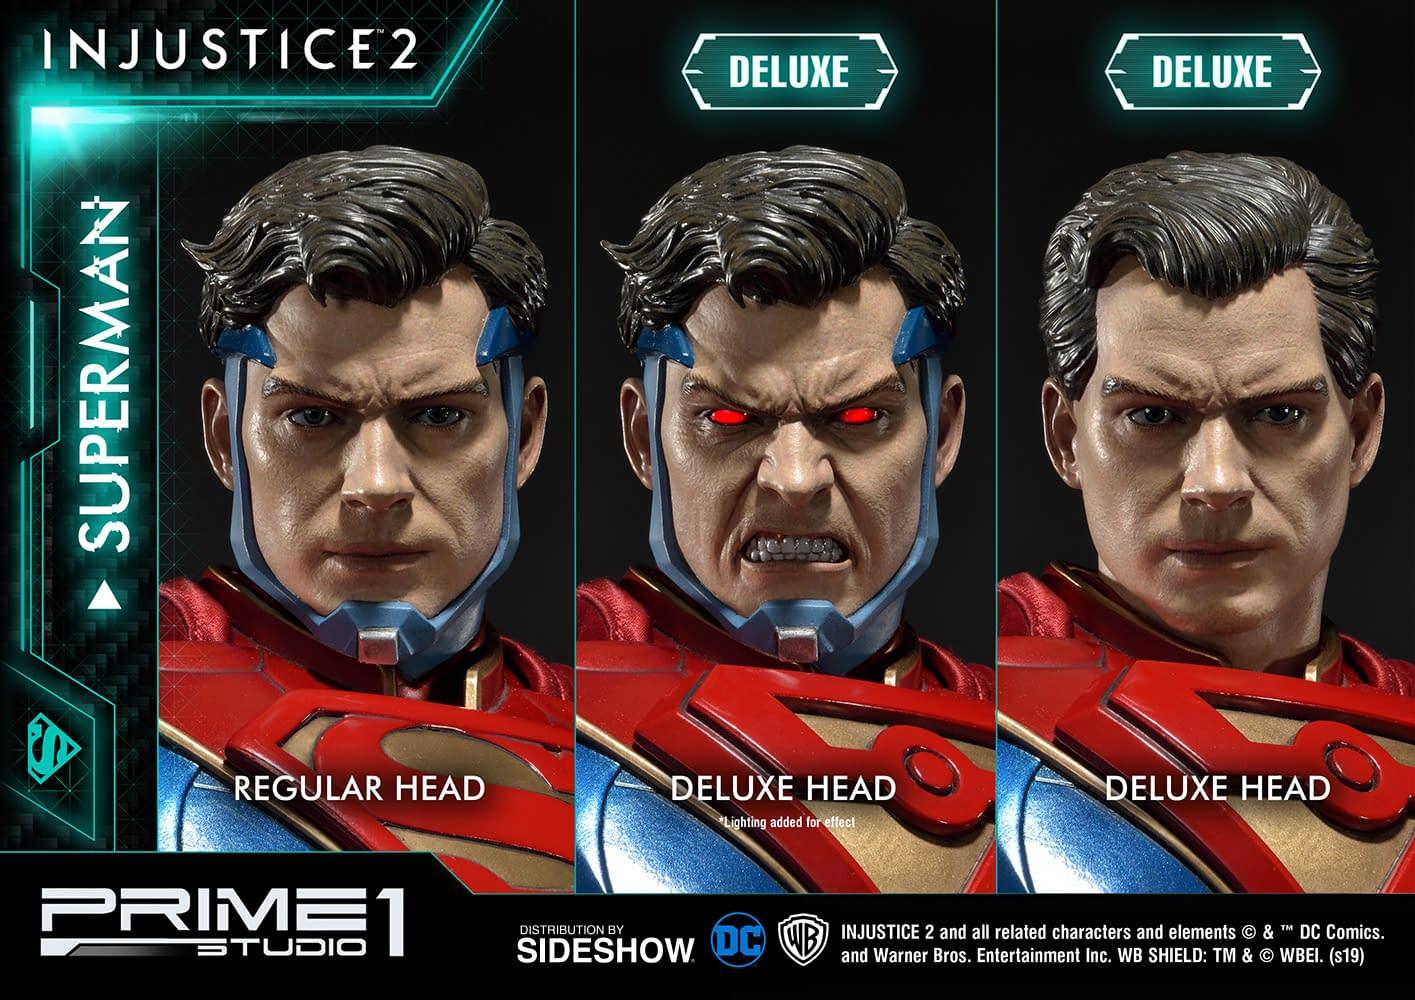 Injustice 2 Superman Statue from Prime 1 Studios